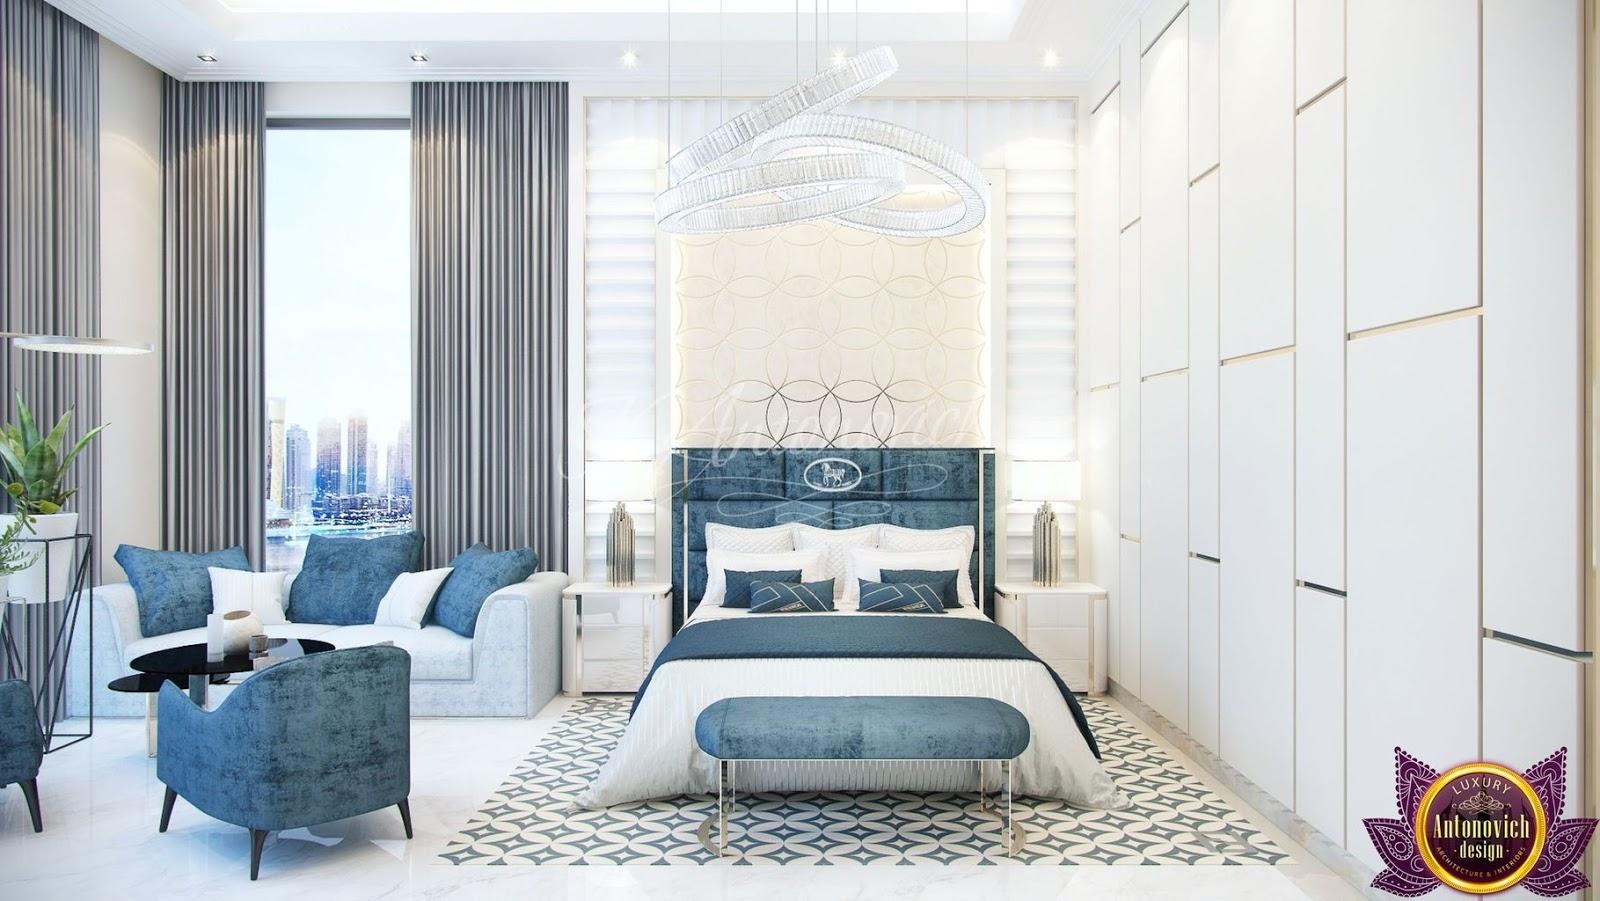 Oman Interior Design: July 2017